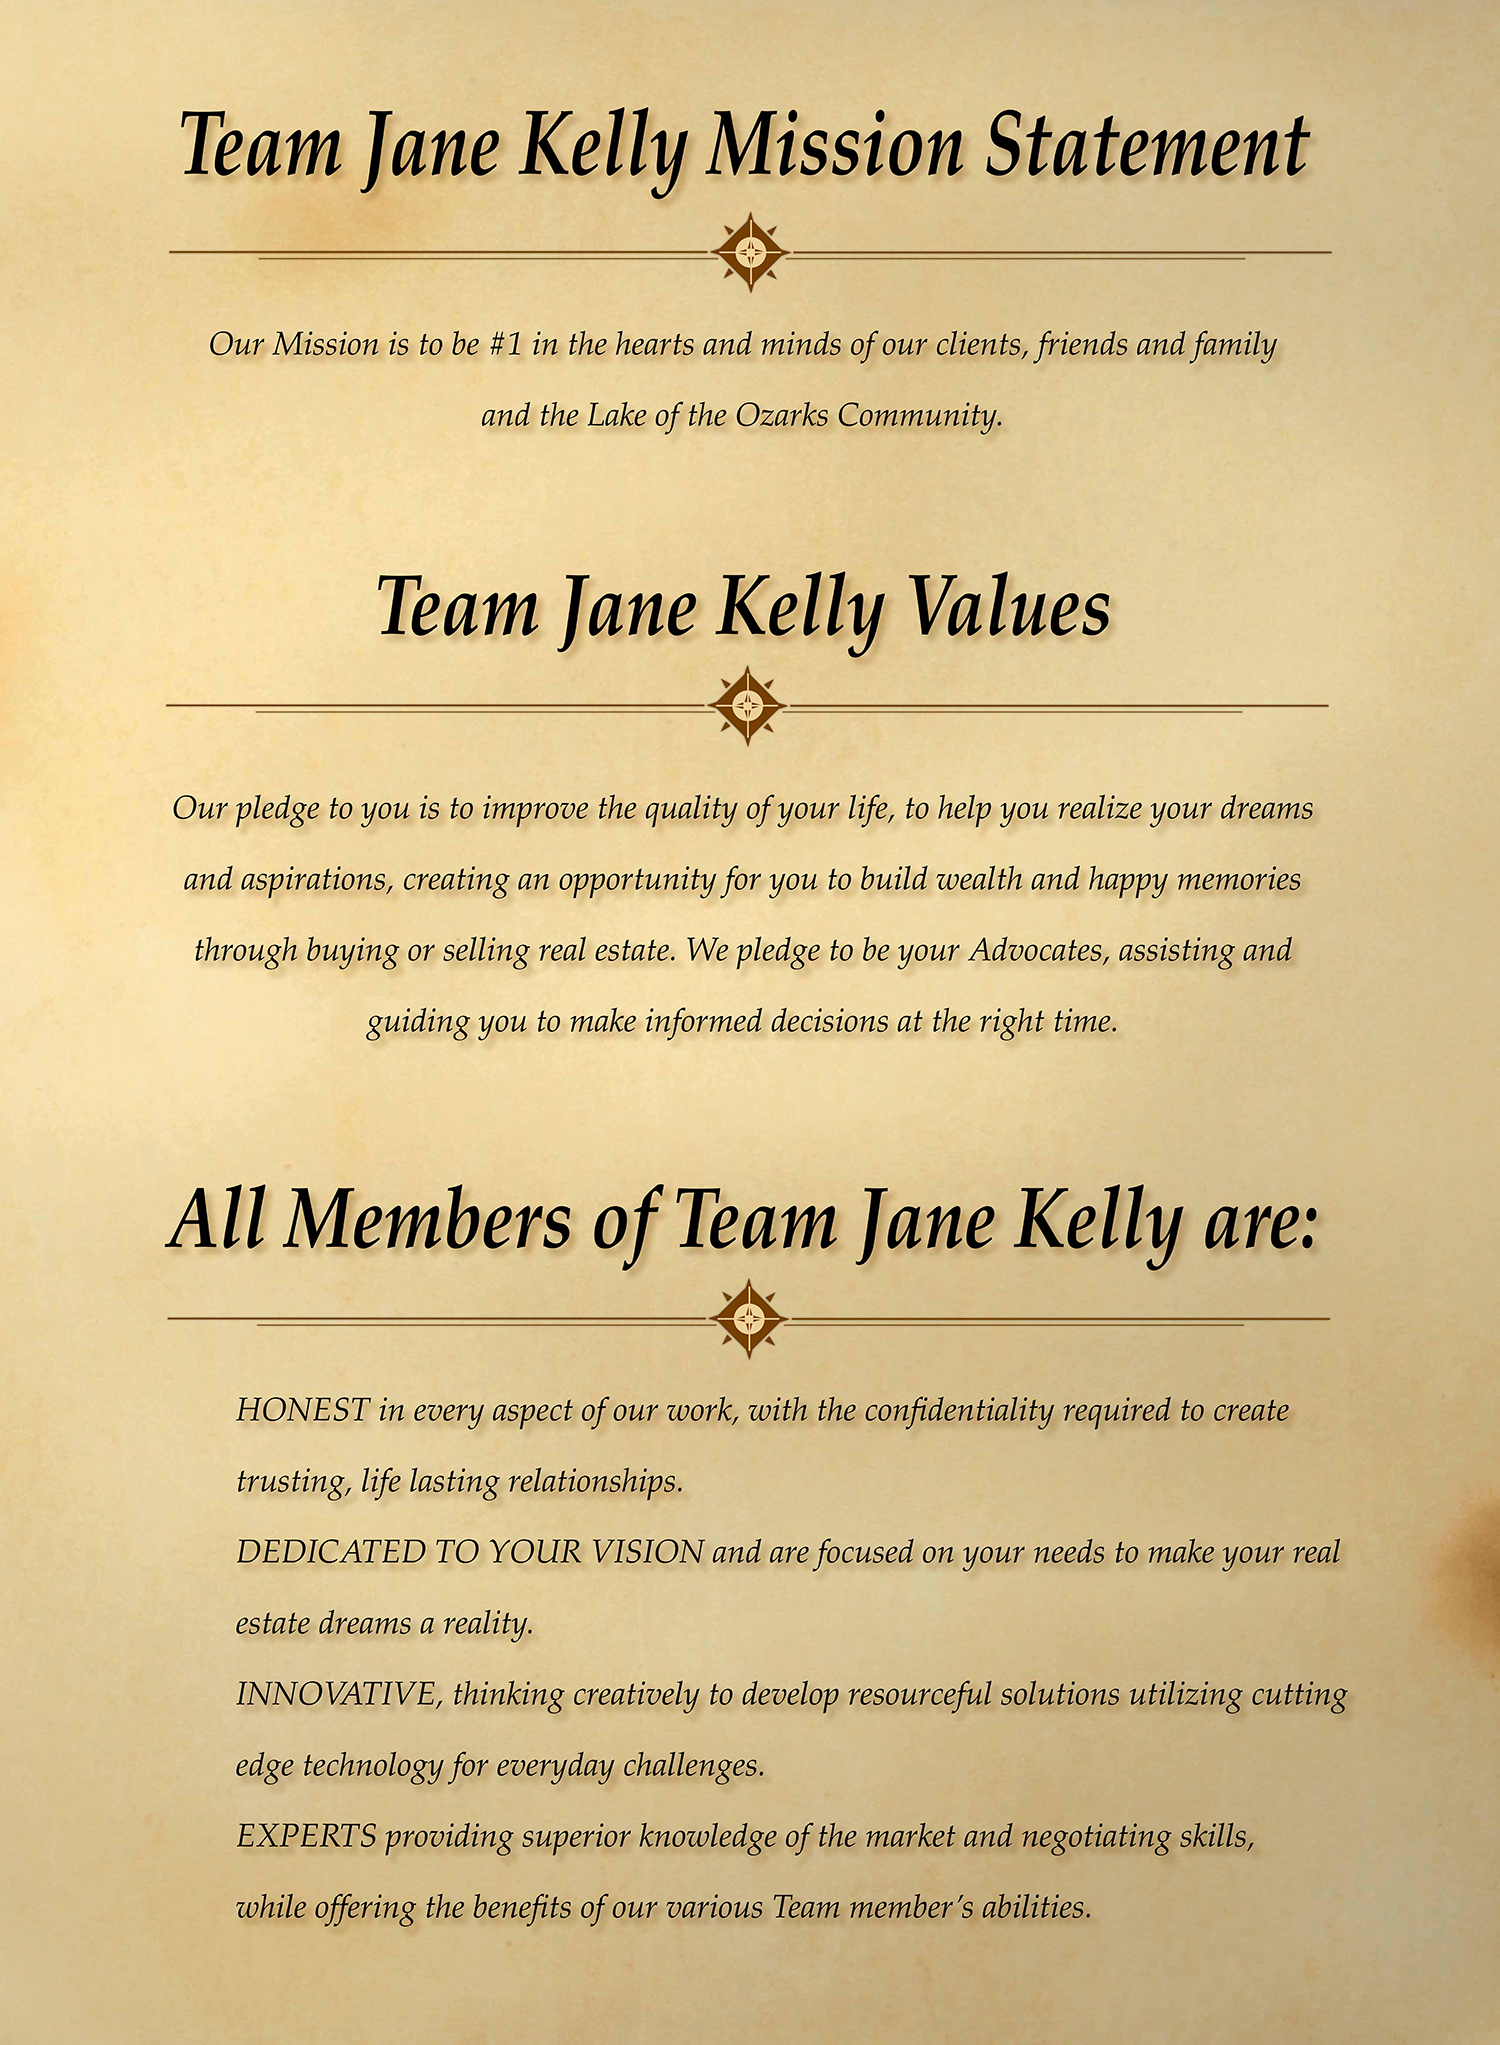 Team Jane Kelly Mission Statement